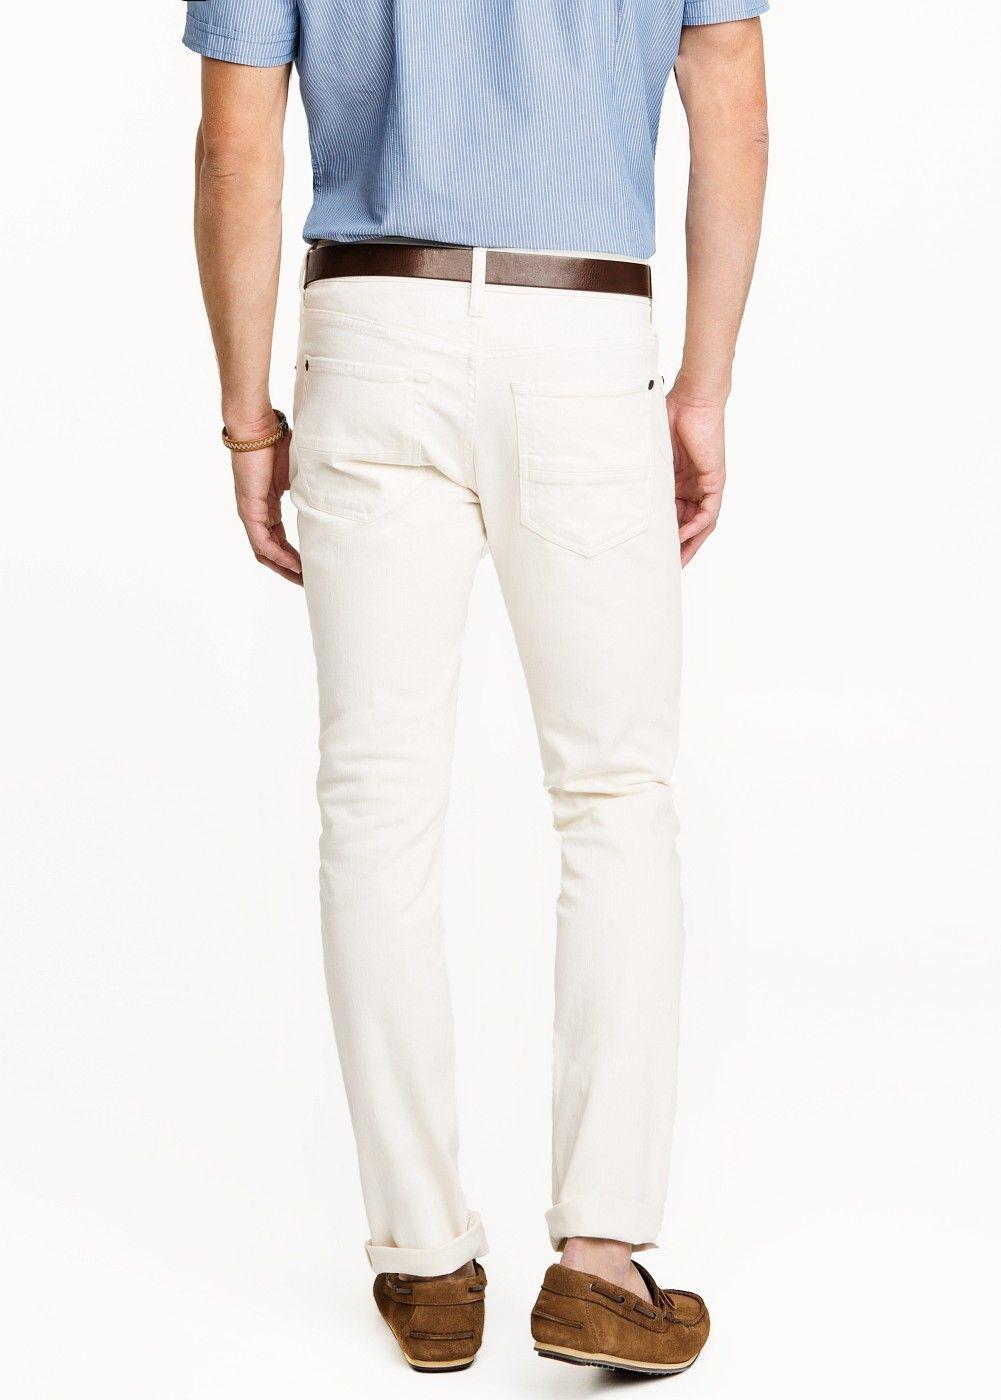 a9f786a2d5 Jeans tim slim-fit crudos - 2